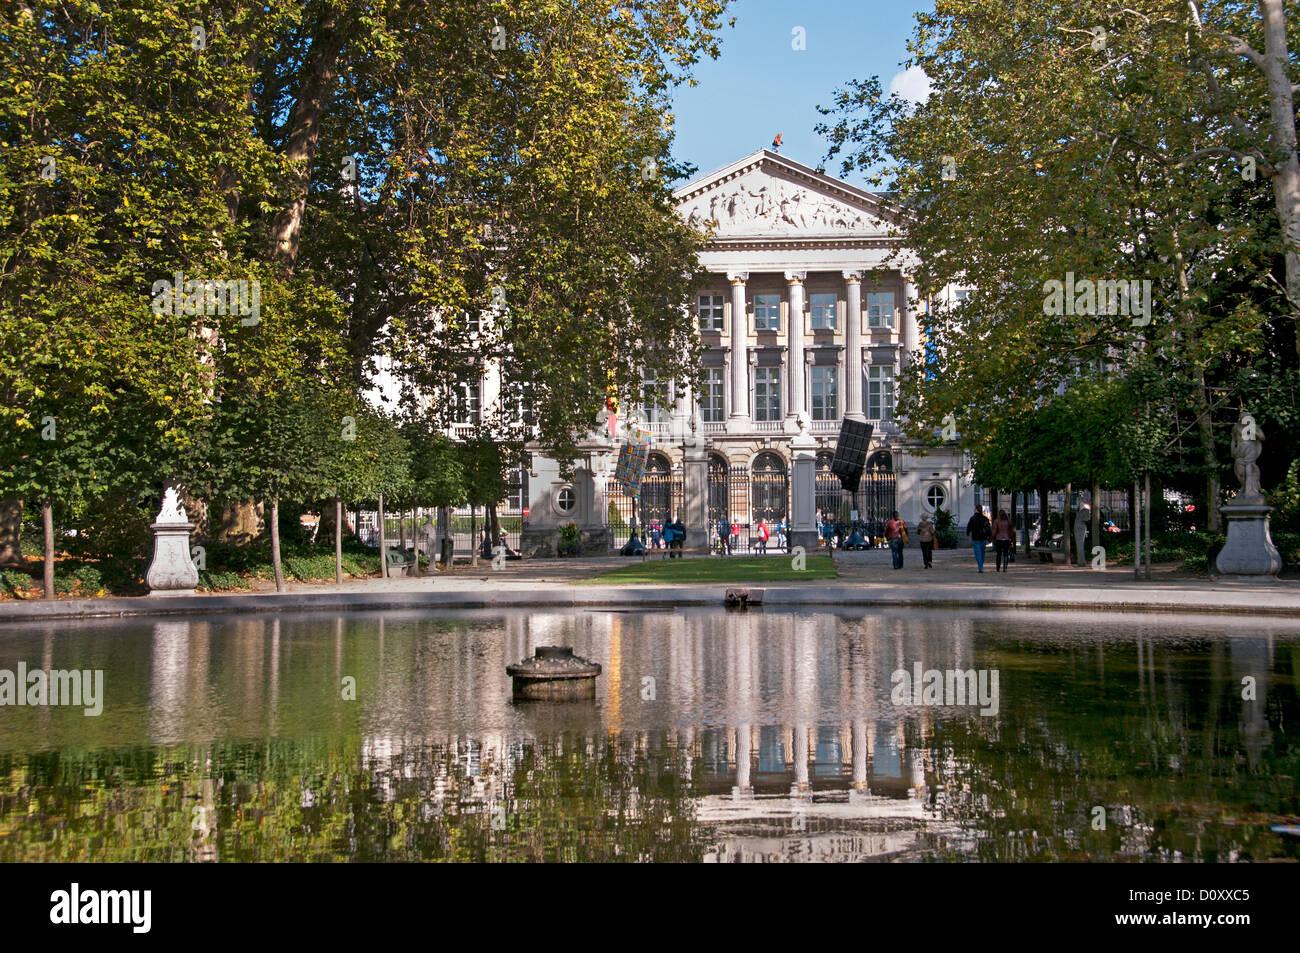 Palais de la Nation or The Palace of the Nation ( Royal Park ) Brussels Belgium - Stock Image